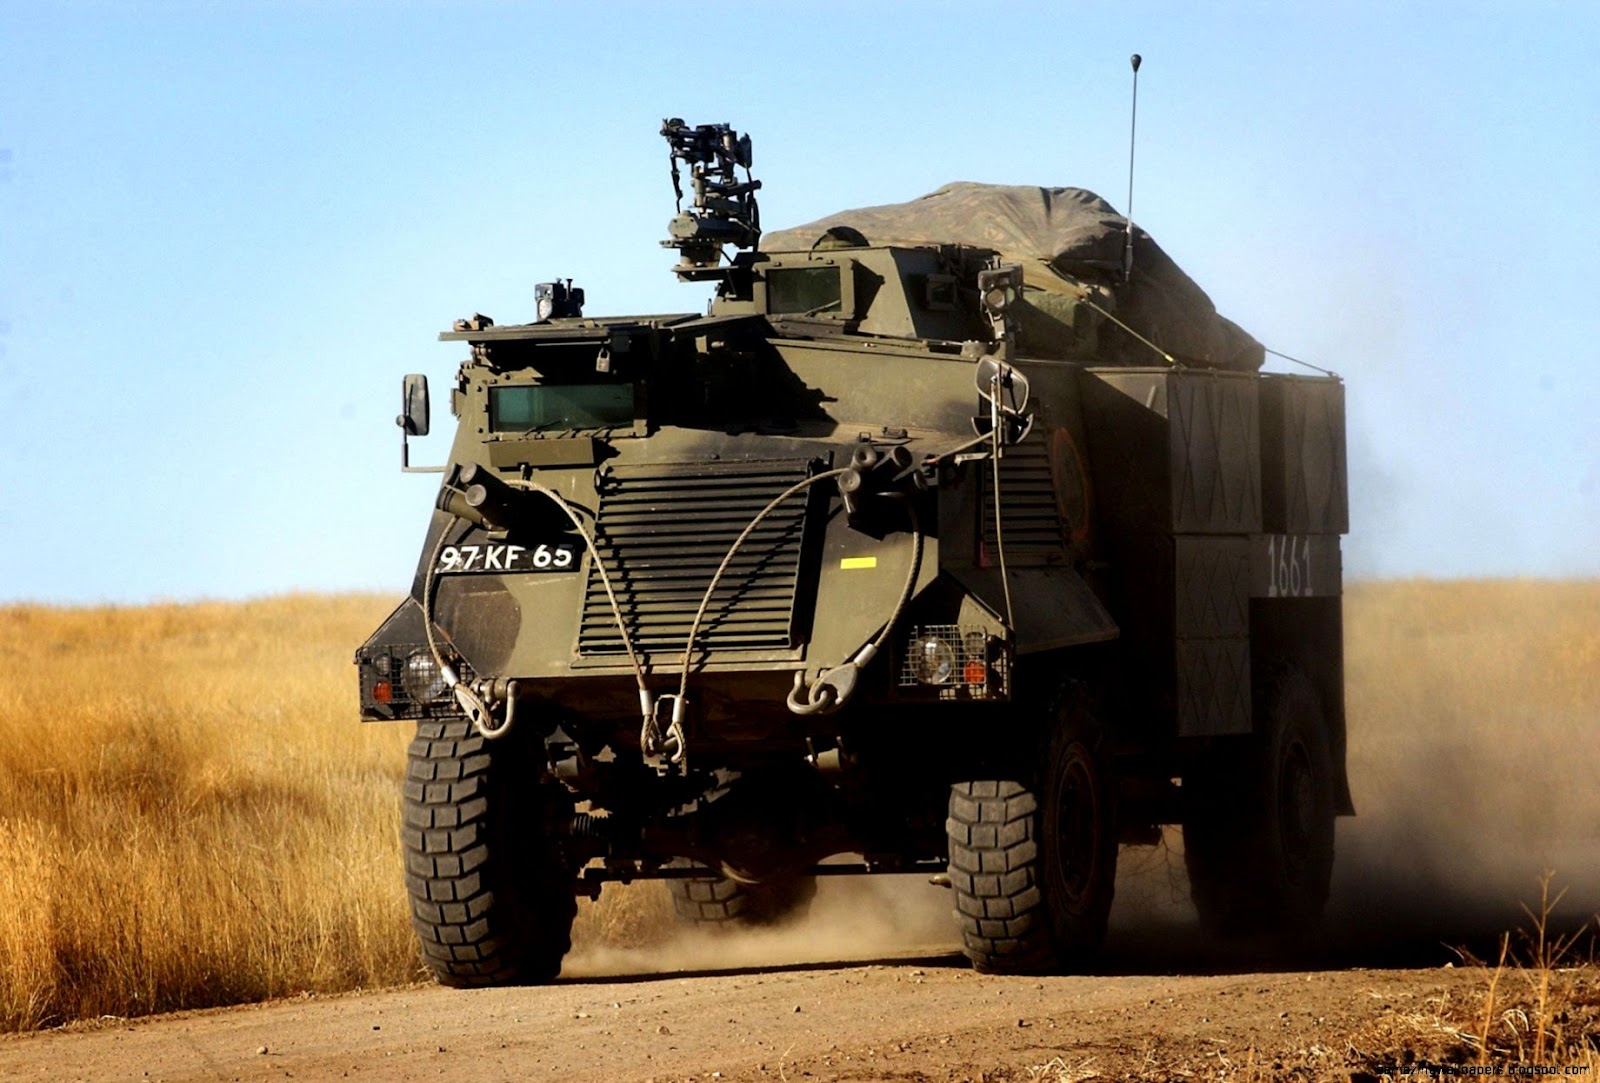 Saxon British Armored Vehicles